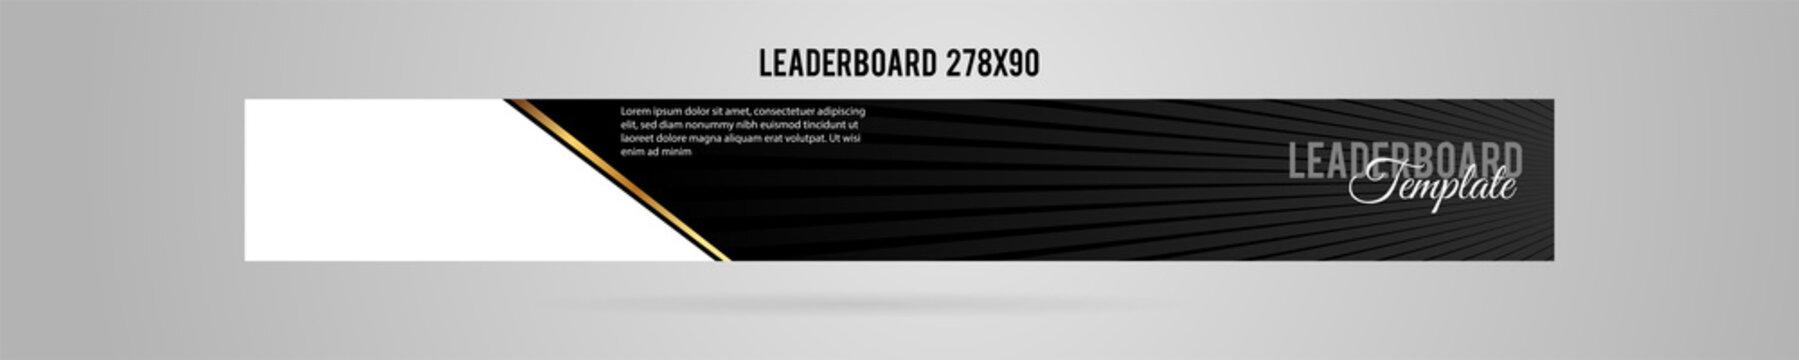 leaderboard 728x90 02